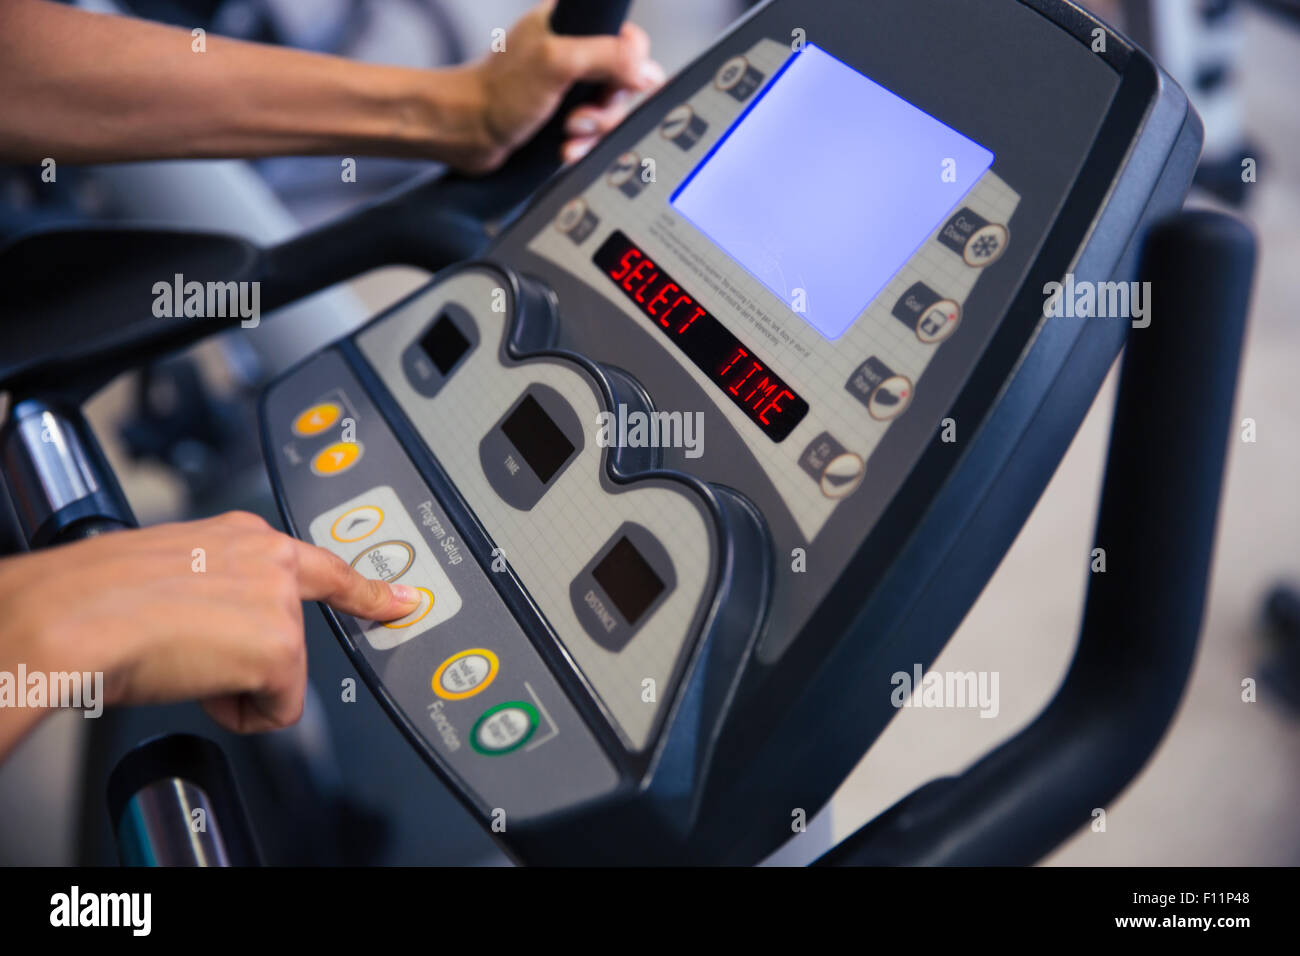 Closeup Portrait der Schnittstelle der Fitness-Maschine im Fitness-Studio Stockbild